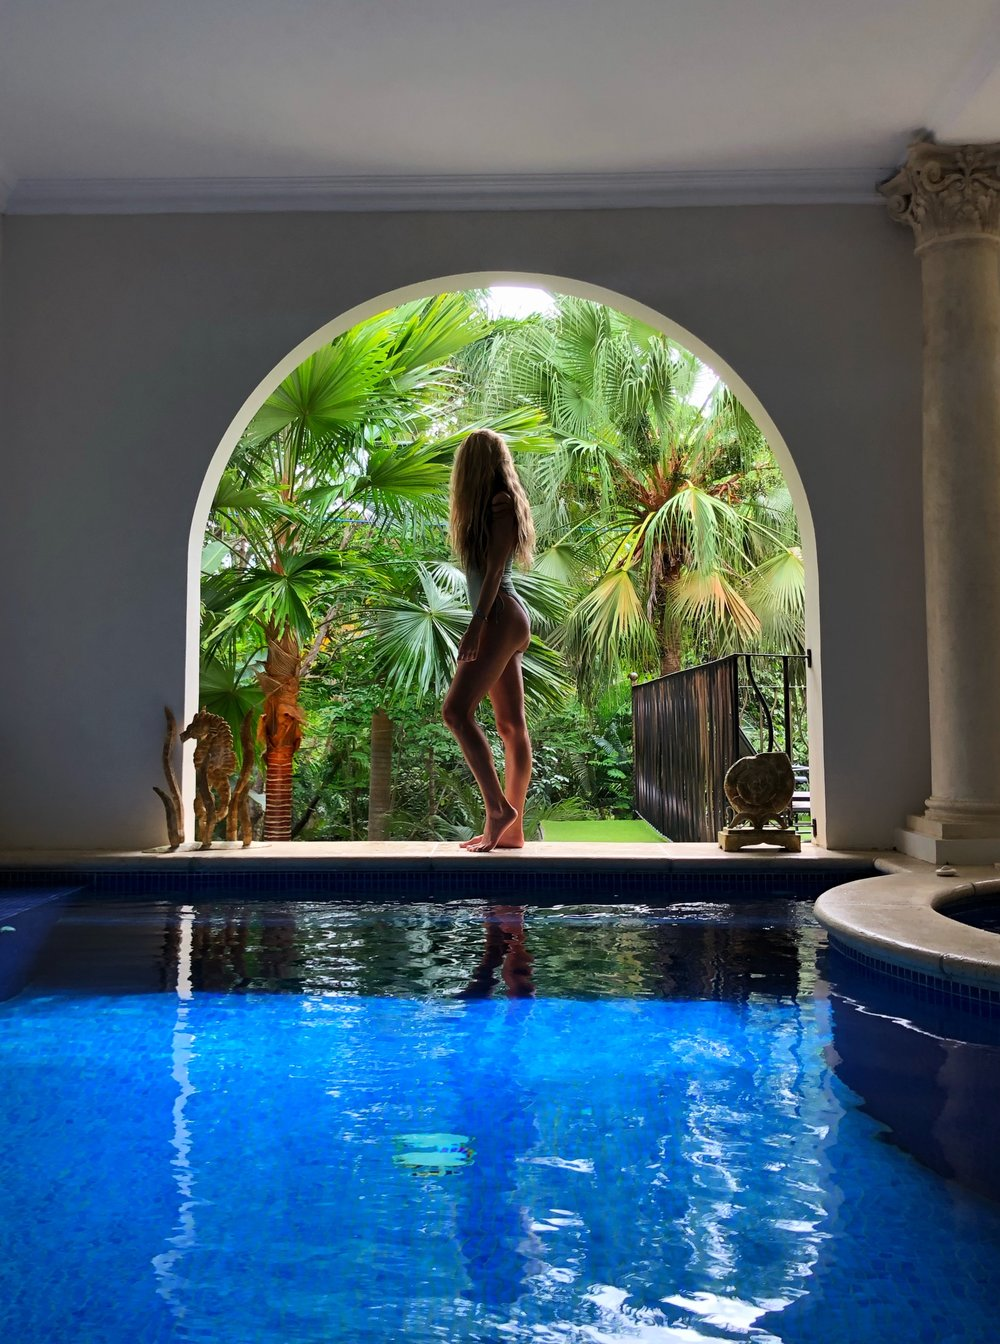 Parador Resort Costa Rica Infinity pool @yoga_ky